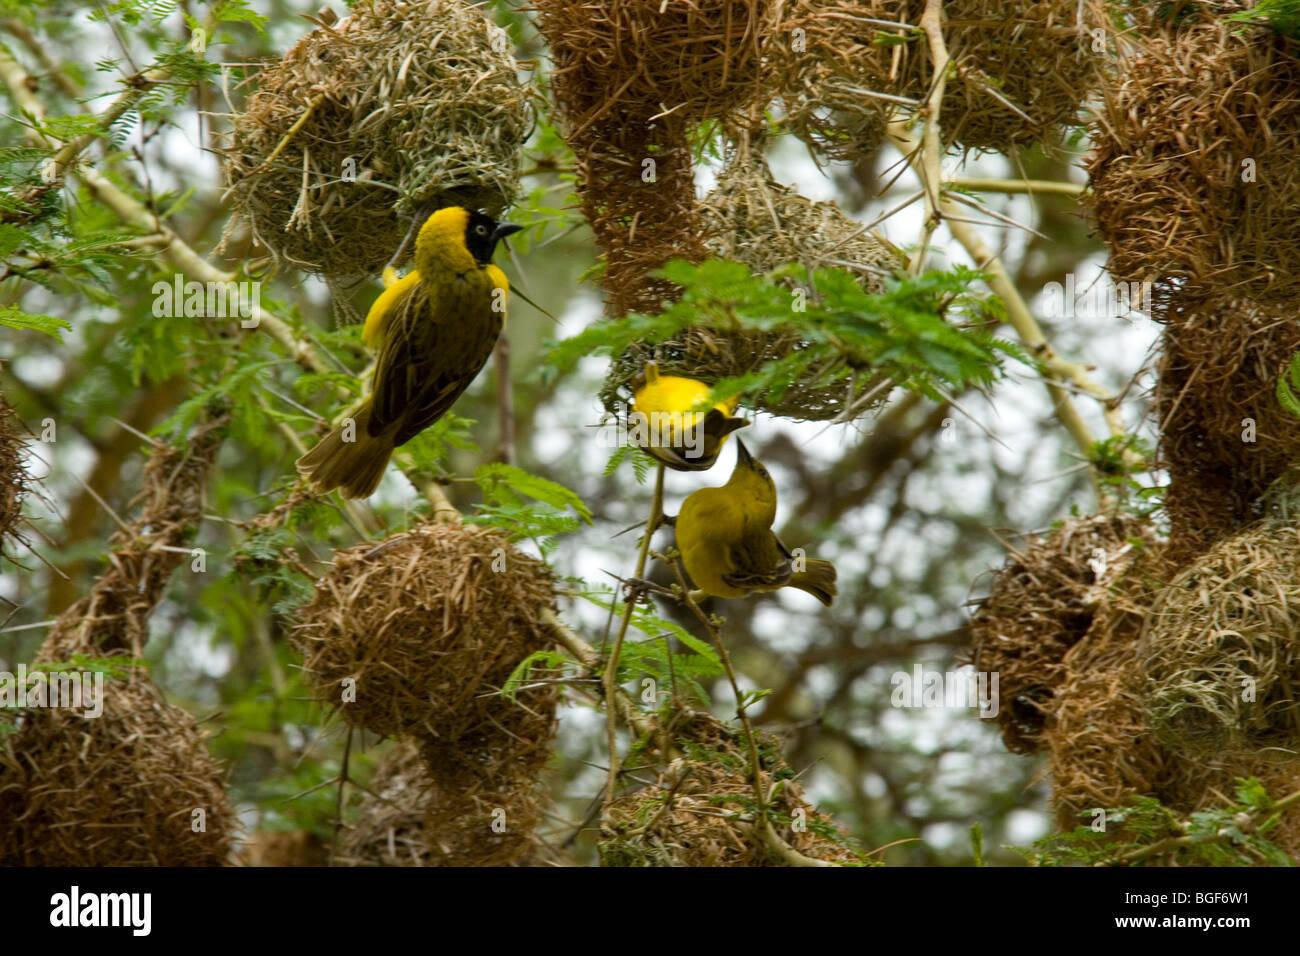 Weaver Bird Nest Stock Photos Weaver Bird Nest Stock Images Alamy